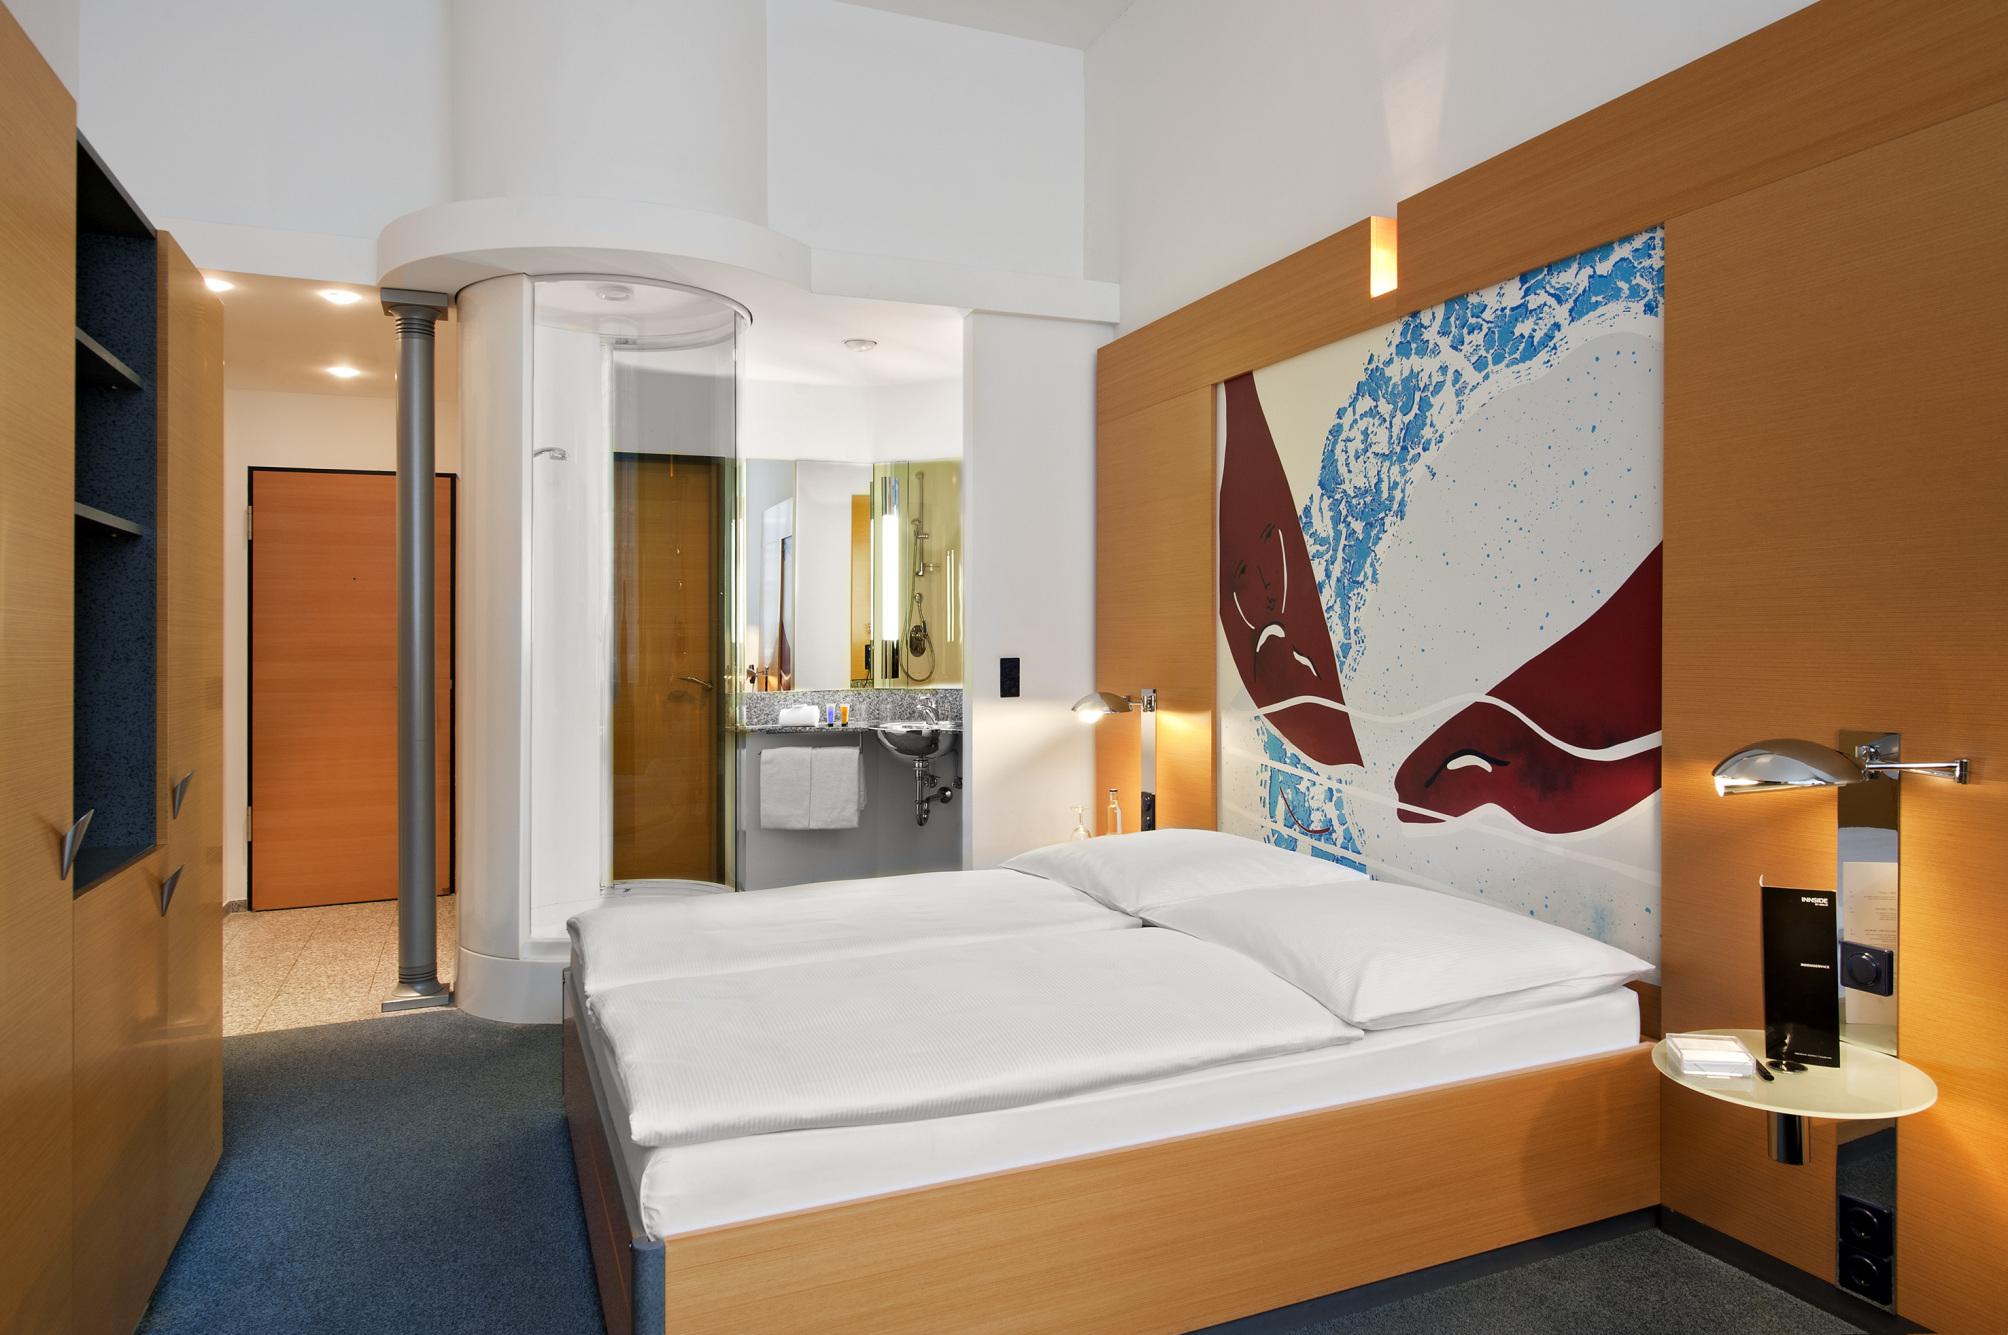 Hotel innside premium hotel berlin em berlim desde 56 rumbo for Hotel innside